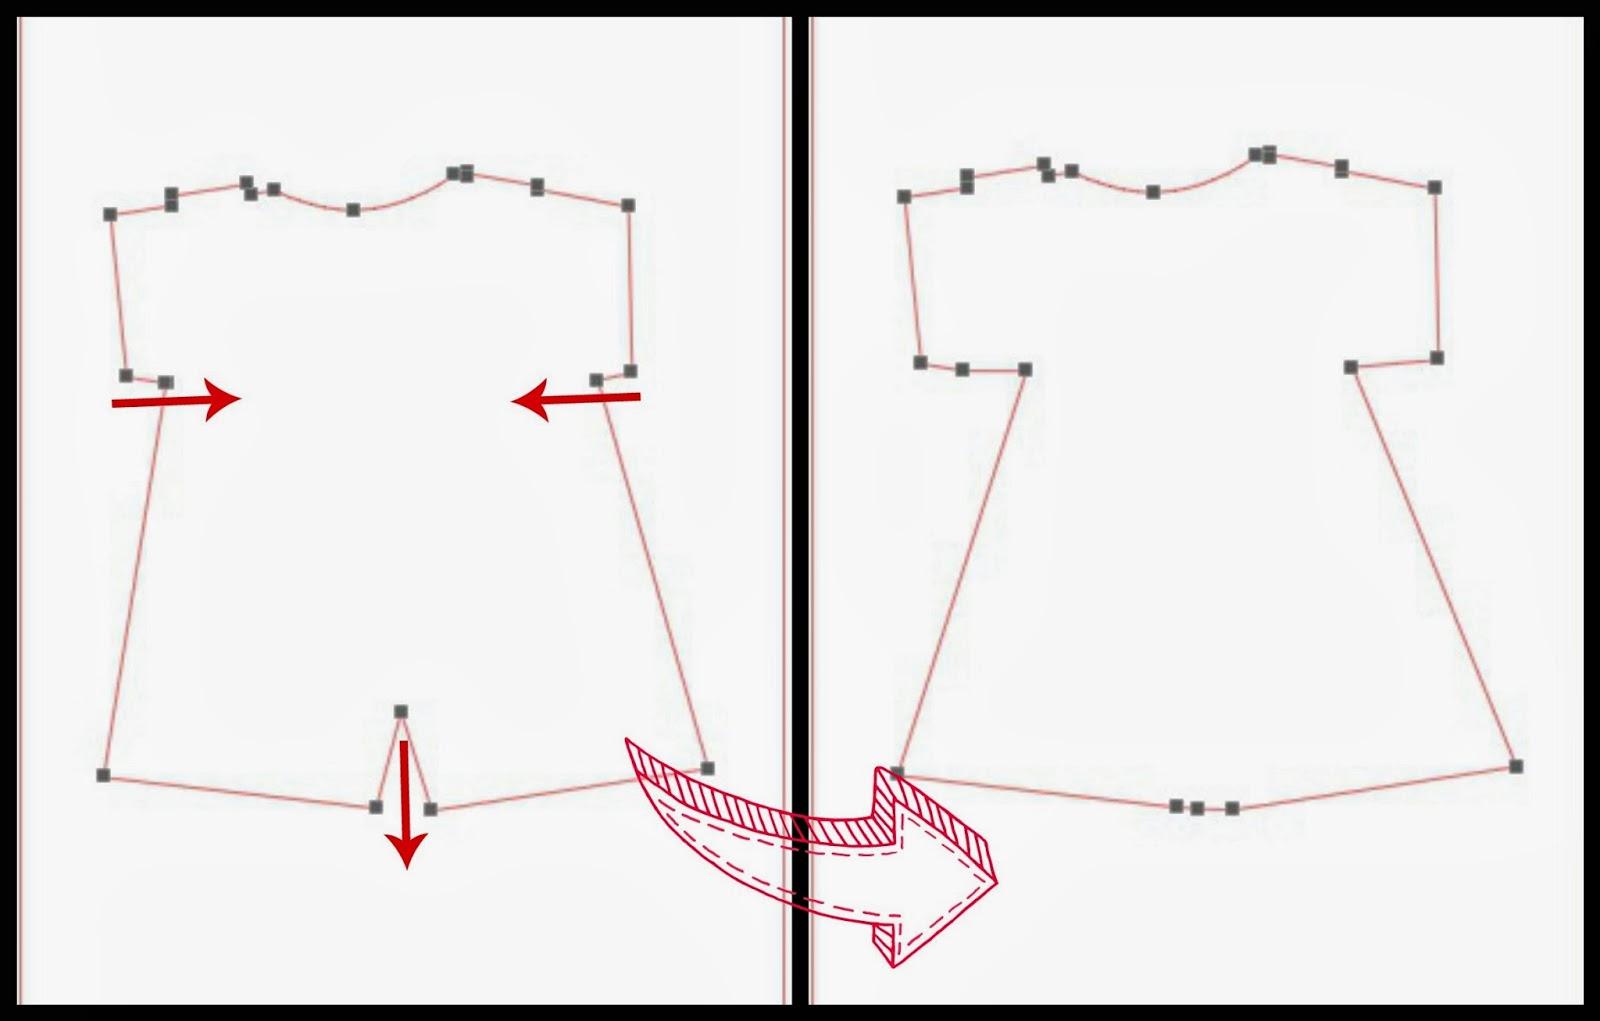 http://silhouetteschool.blogspot.com/2014/02/changing-silhouette-designs-point.html